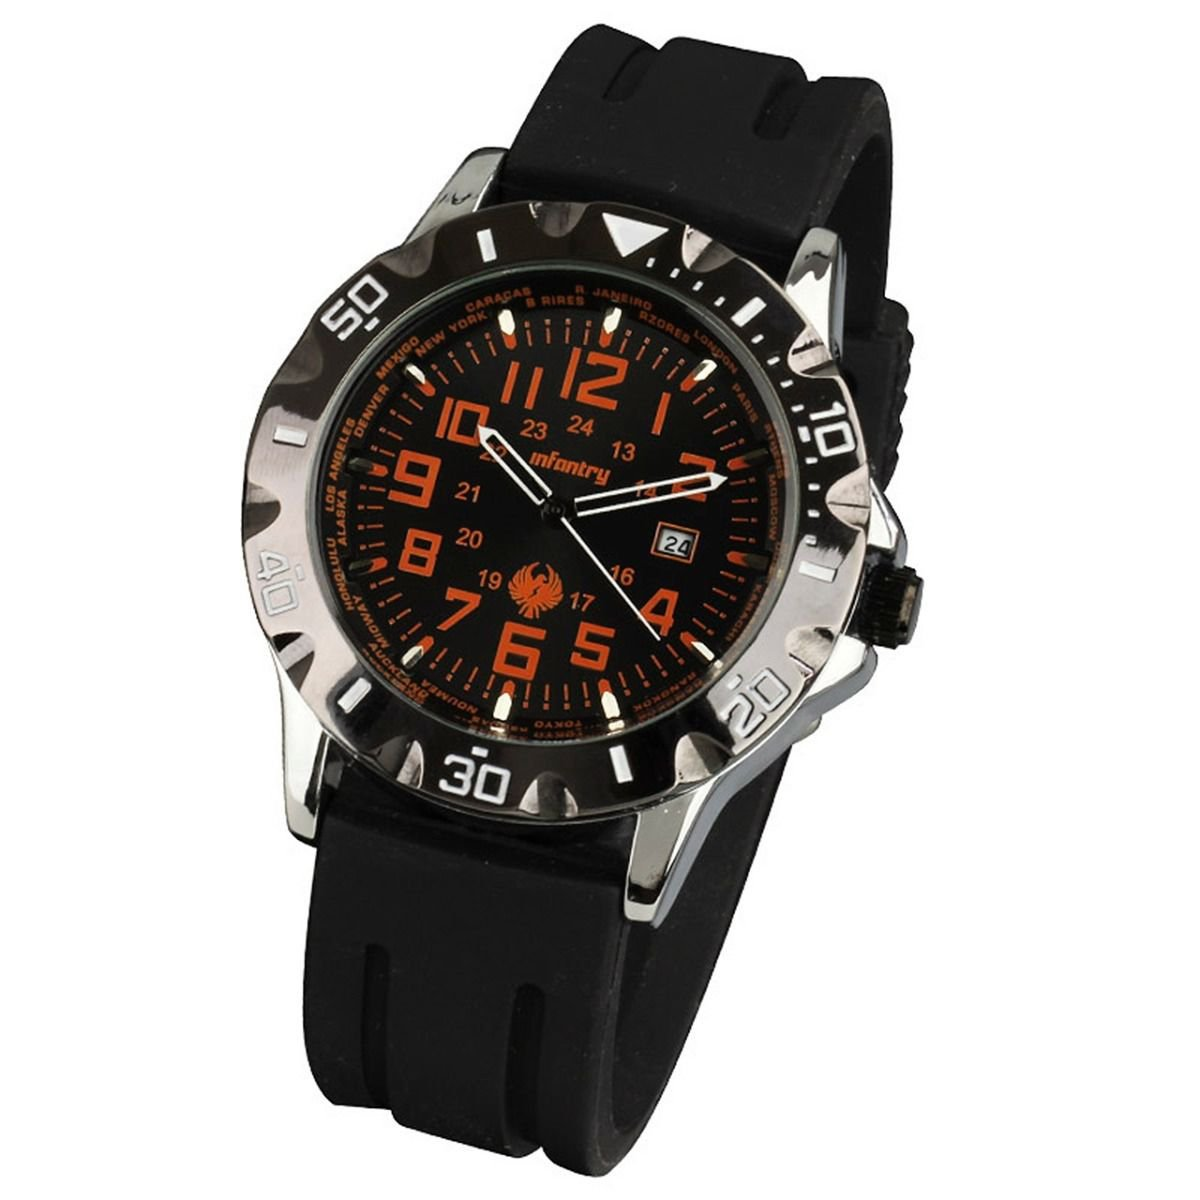 New Infantry Mens Quartz 24h Dial Sport Wrist Watch Black Rubber Band Waterproof